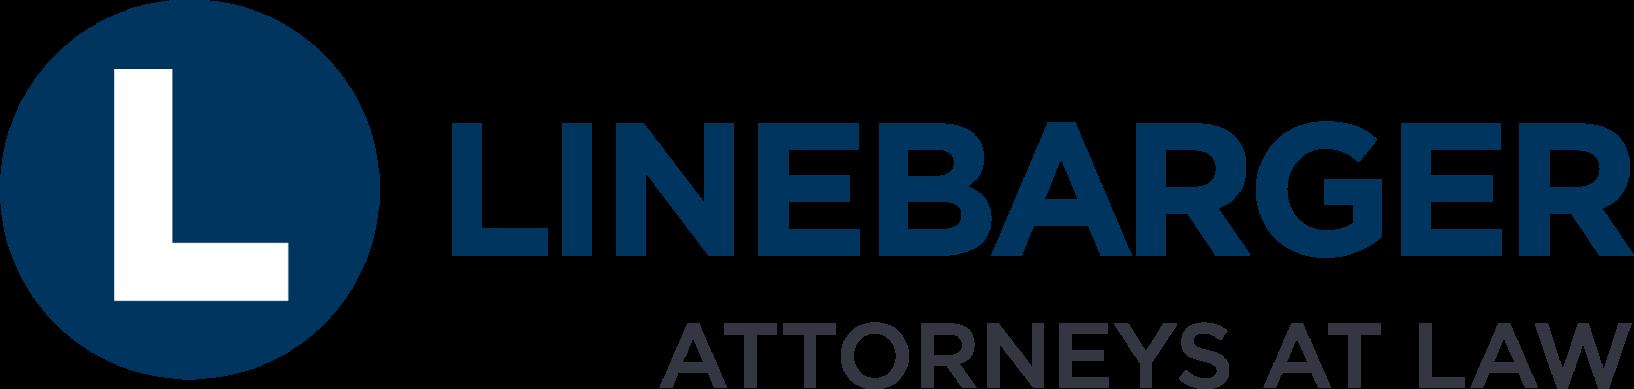 Linebarger Logo